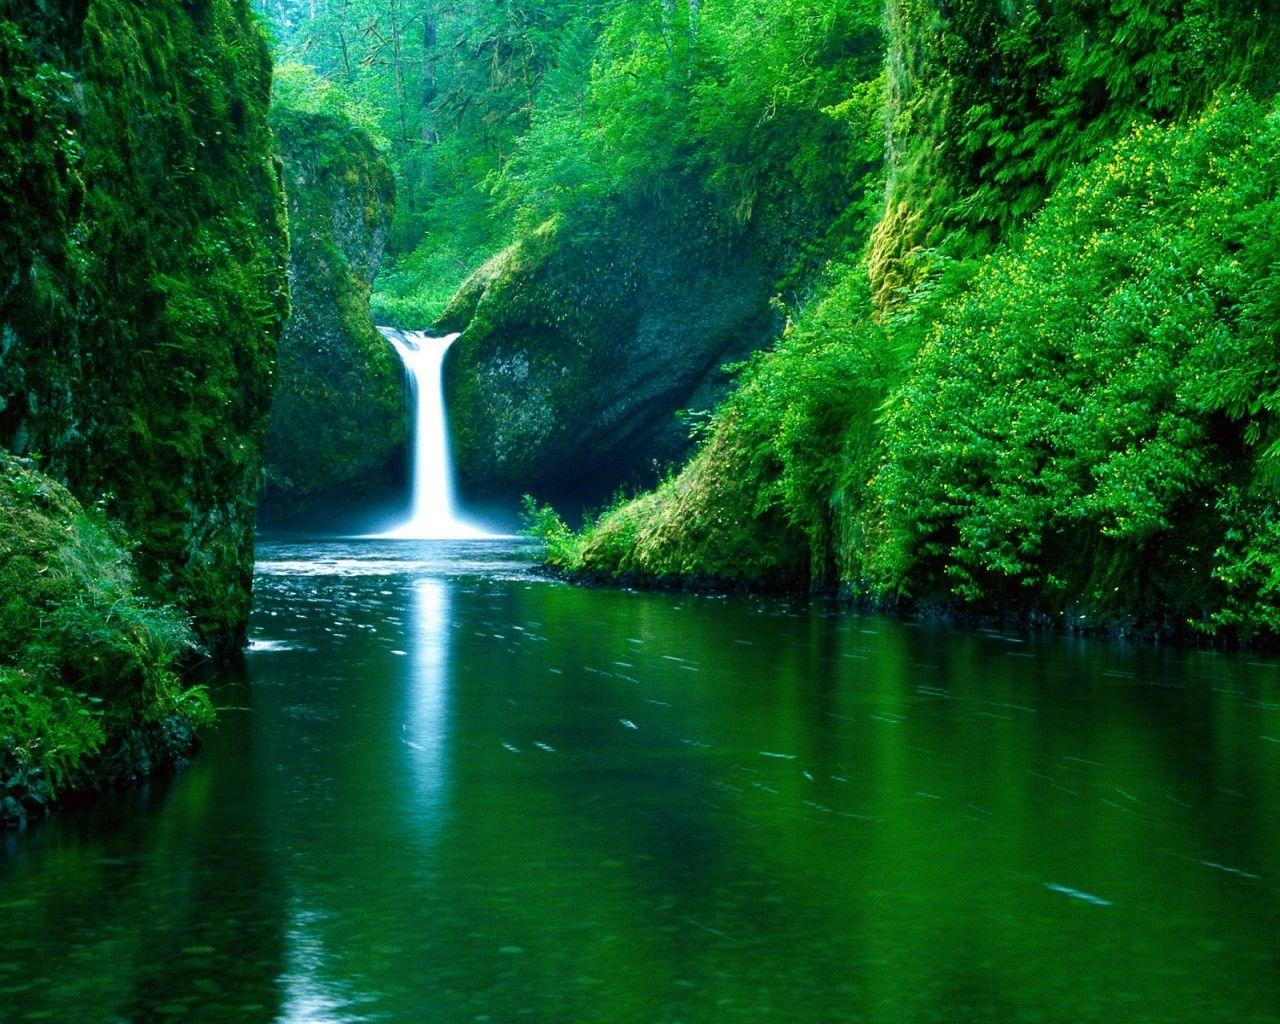 Green Landscape Wallpapers Hd Green Landscape Wallpaper Waterfall Wallpaper Beautiful Nature Punchbowl Falls